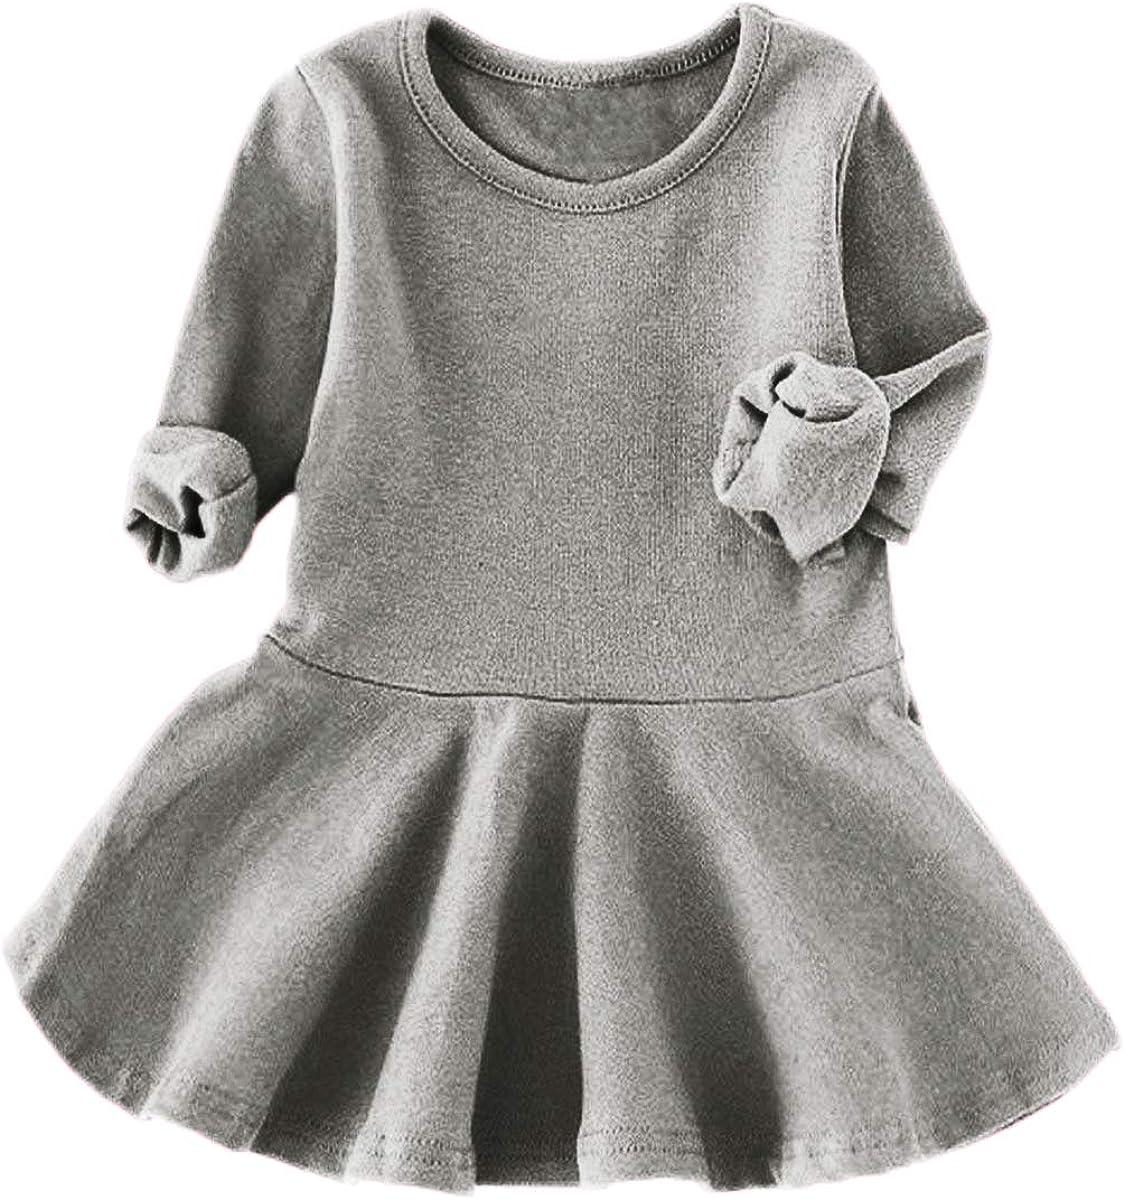 lymanchi Toddler Baby Girl Cotton Dress Long//Short Sleeve Ruffle Cozy Casual Top